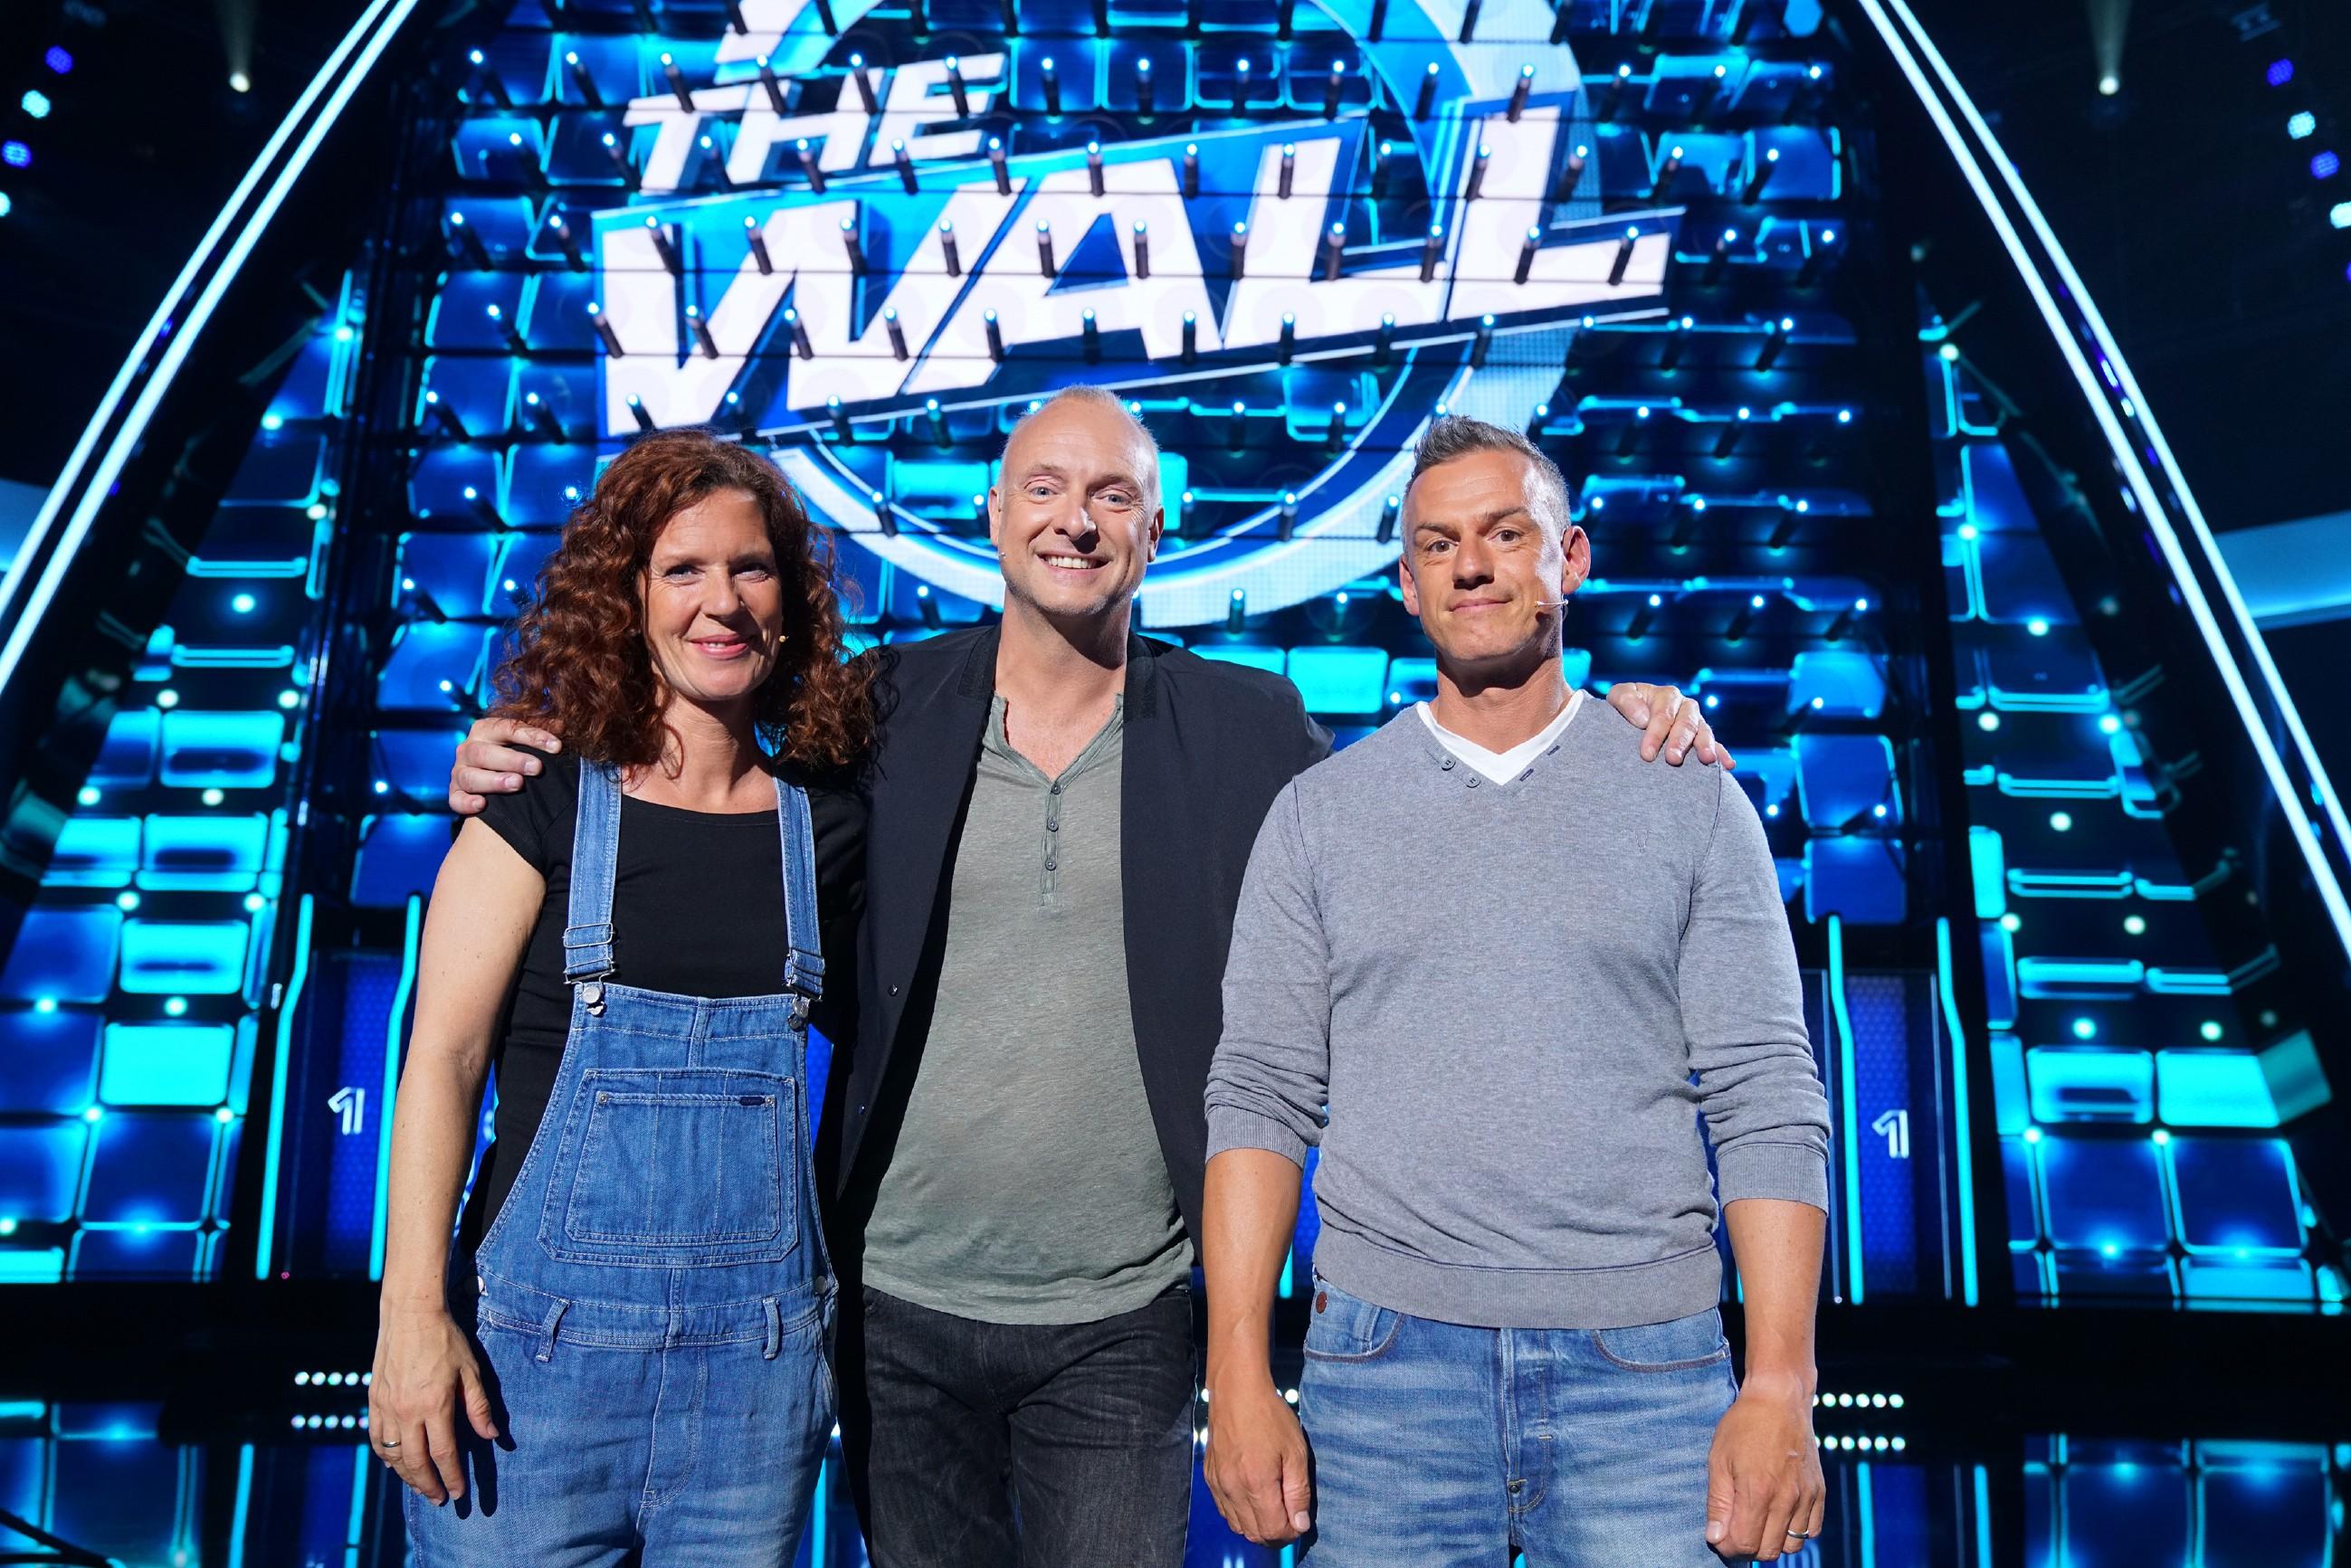 The Wall - Rona und Mischa aus Wesseling